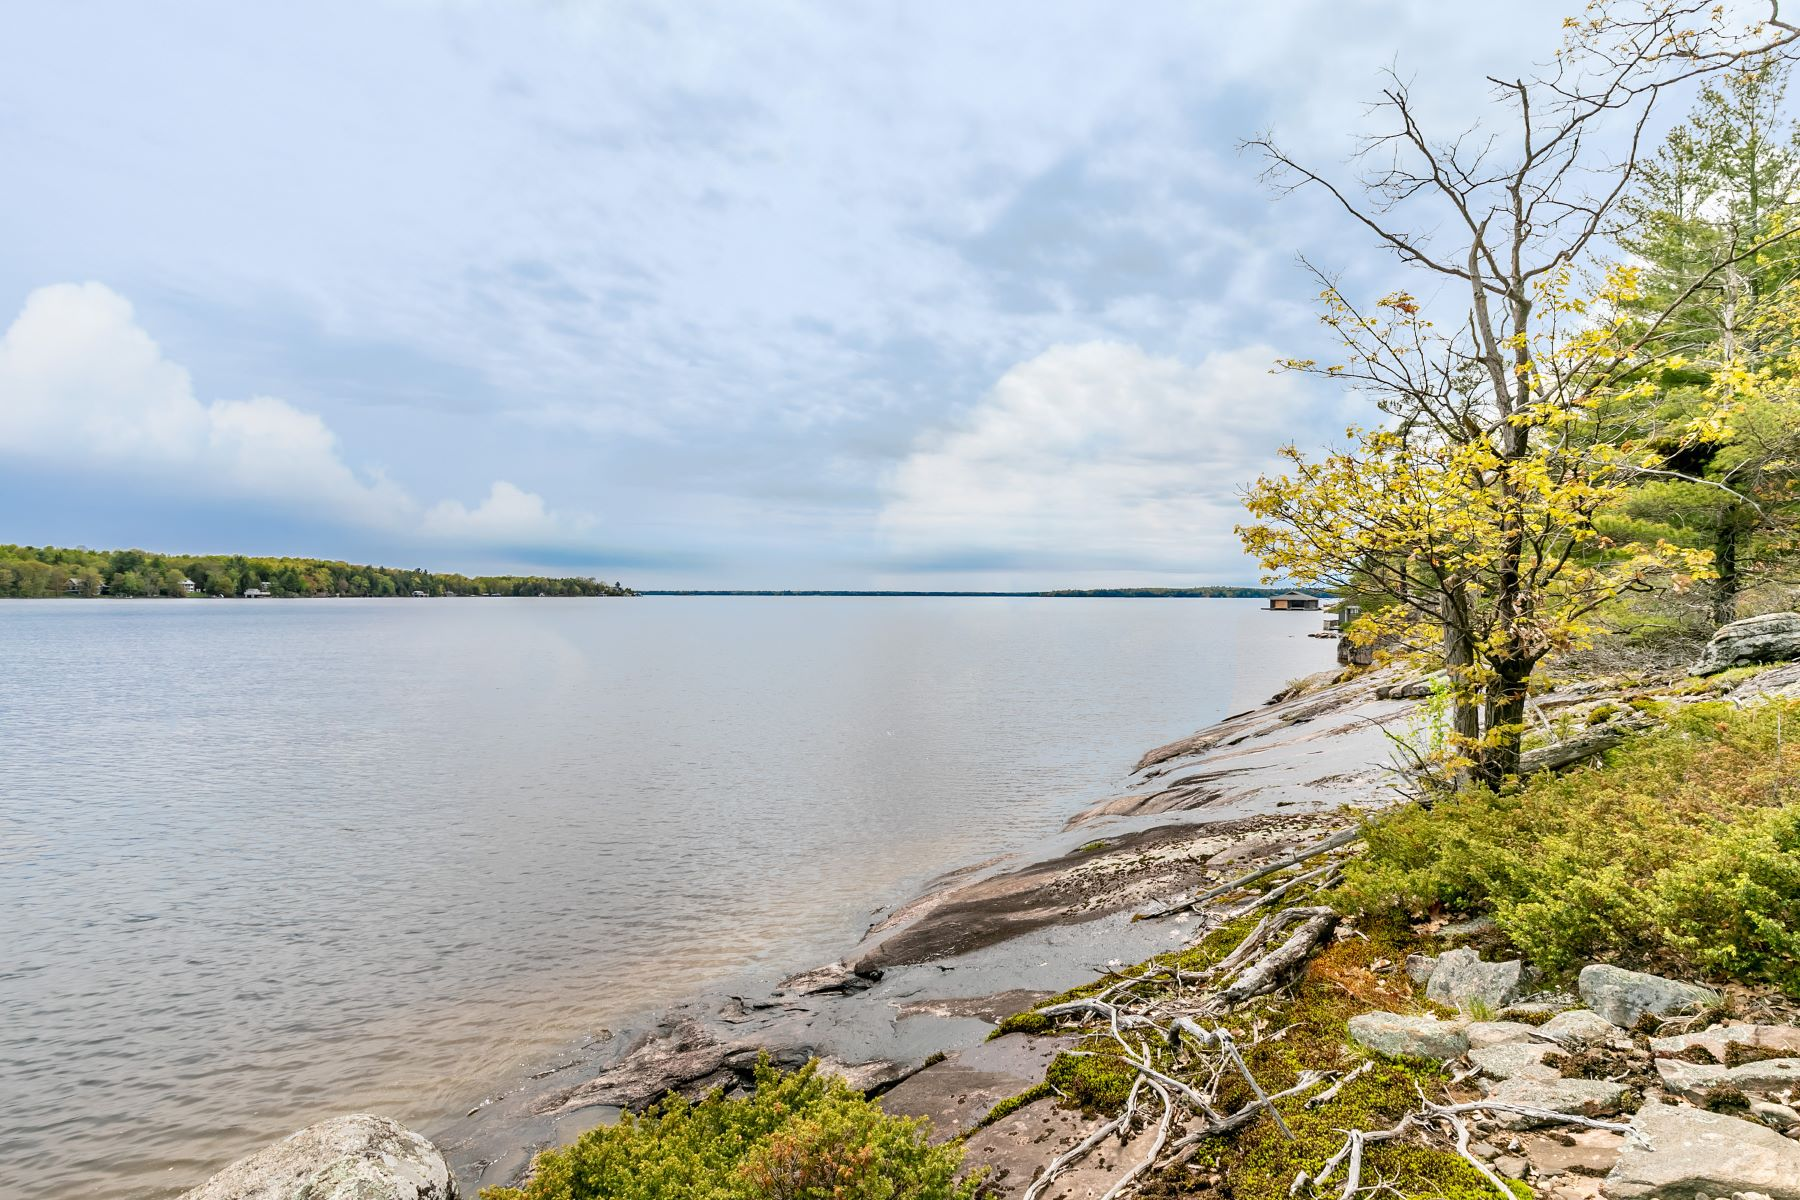 Land for Sale at Fantastic Lake Muskoka Lot 1101 Strawberry Lane Bracebridge, Ontario P1L 1X2 Canada